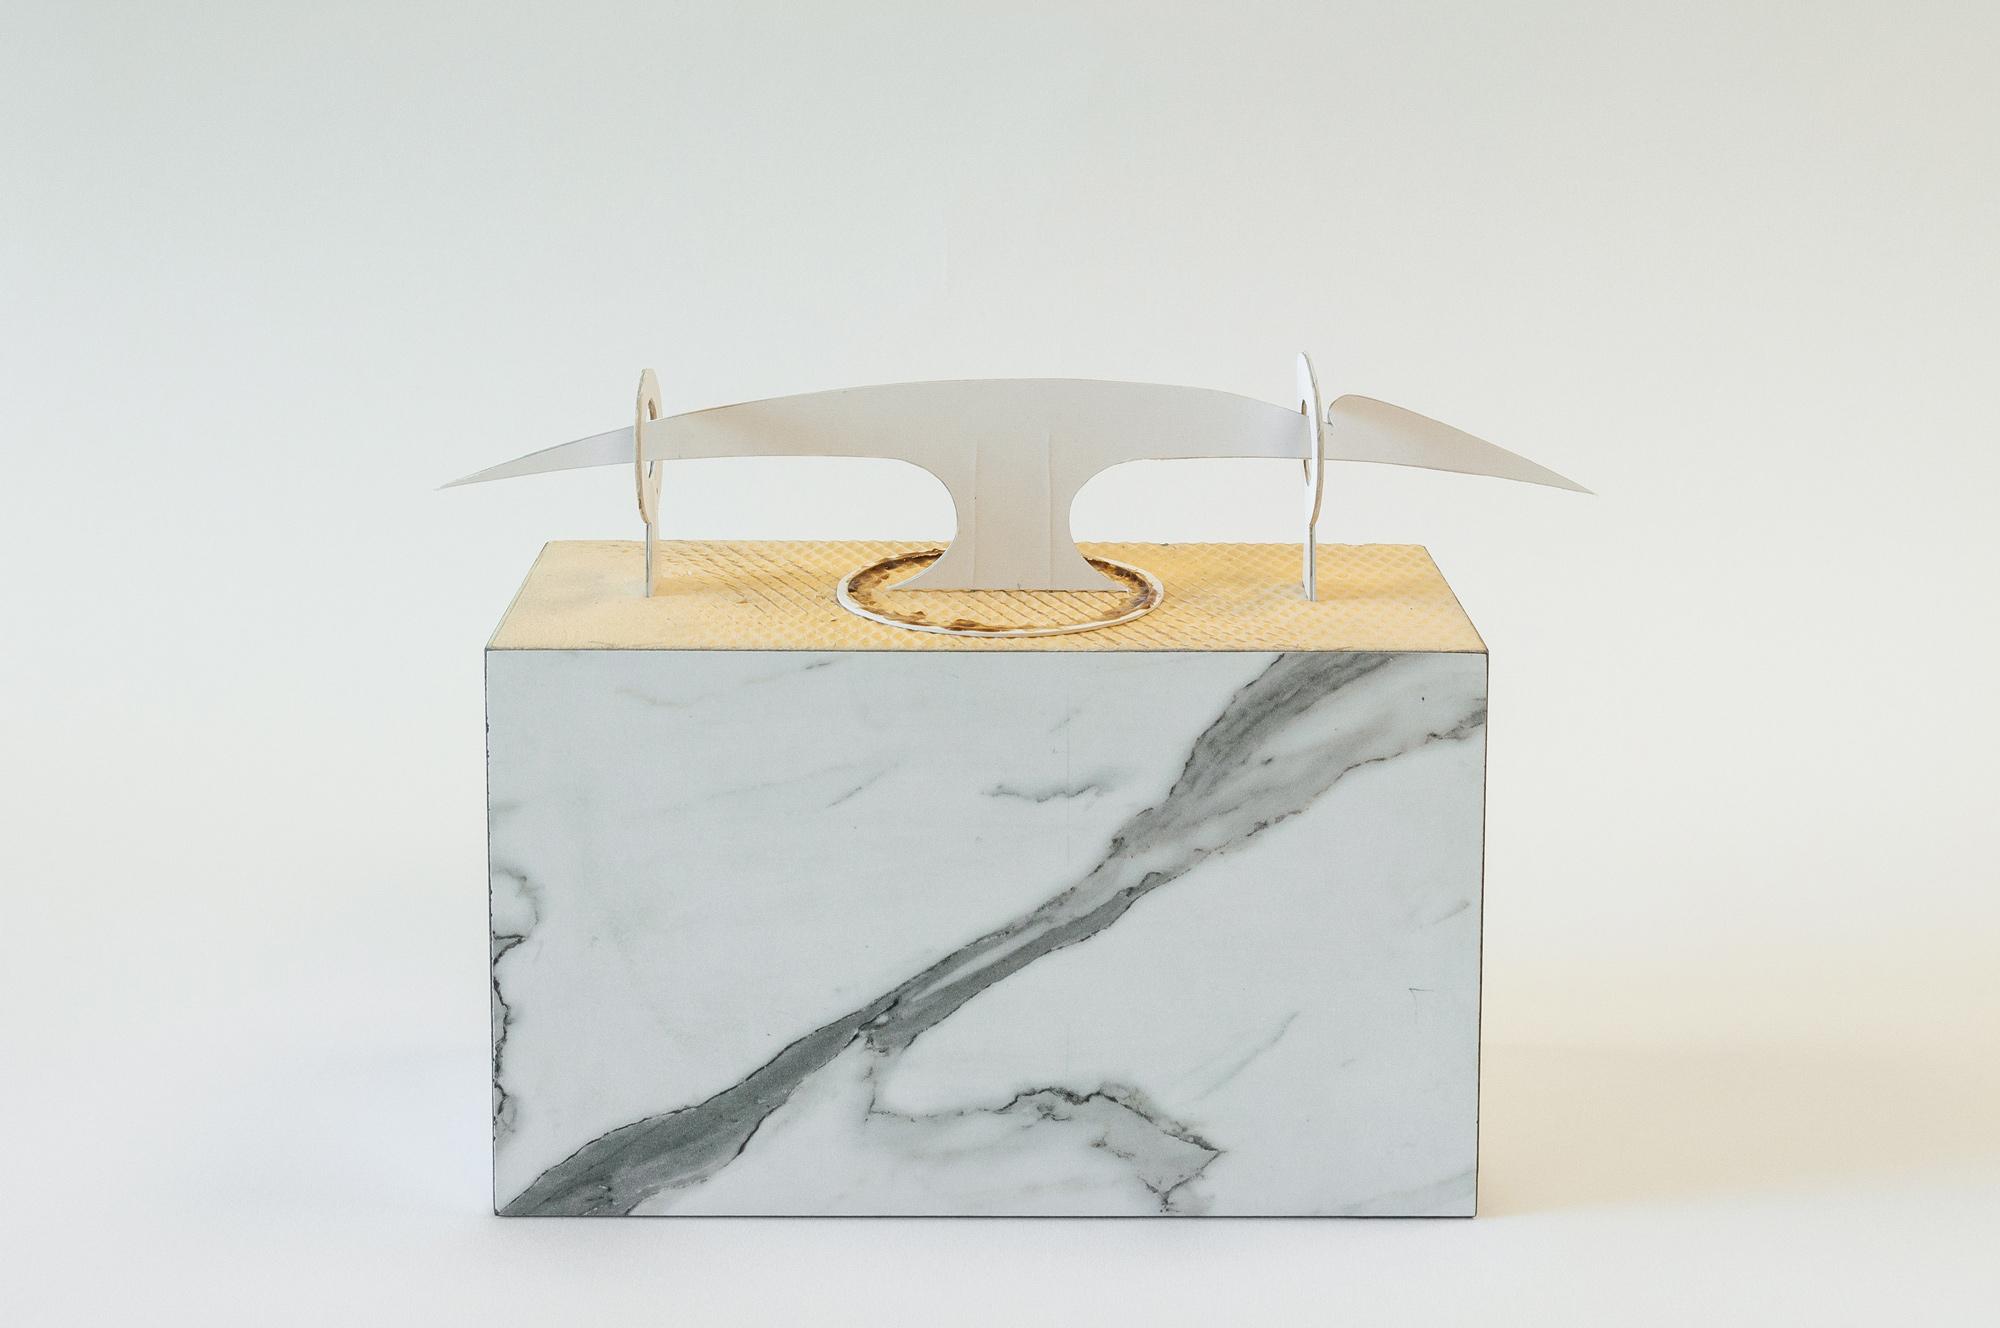 лук │ wood, plastic, cardboard │ 2020 │ 21cm x 32cm x 11cm